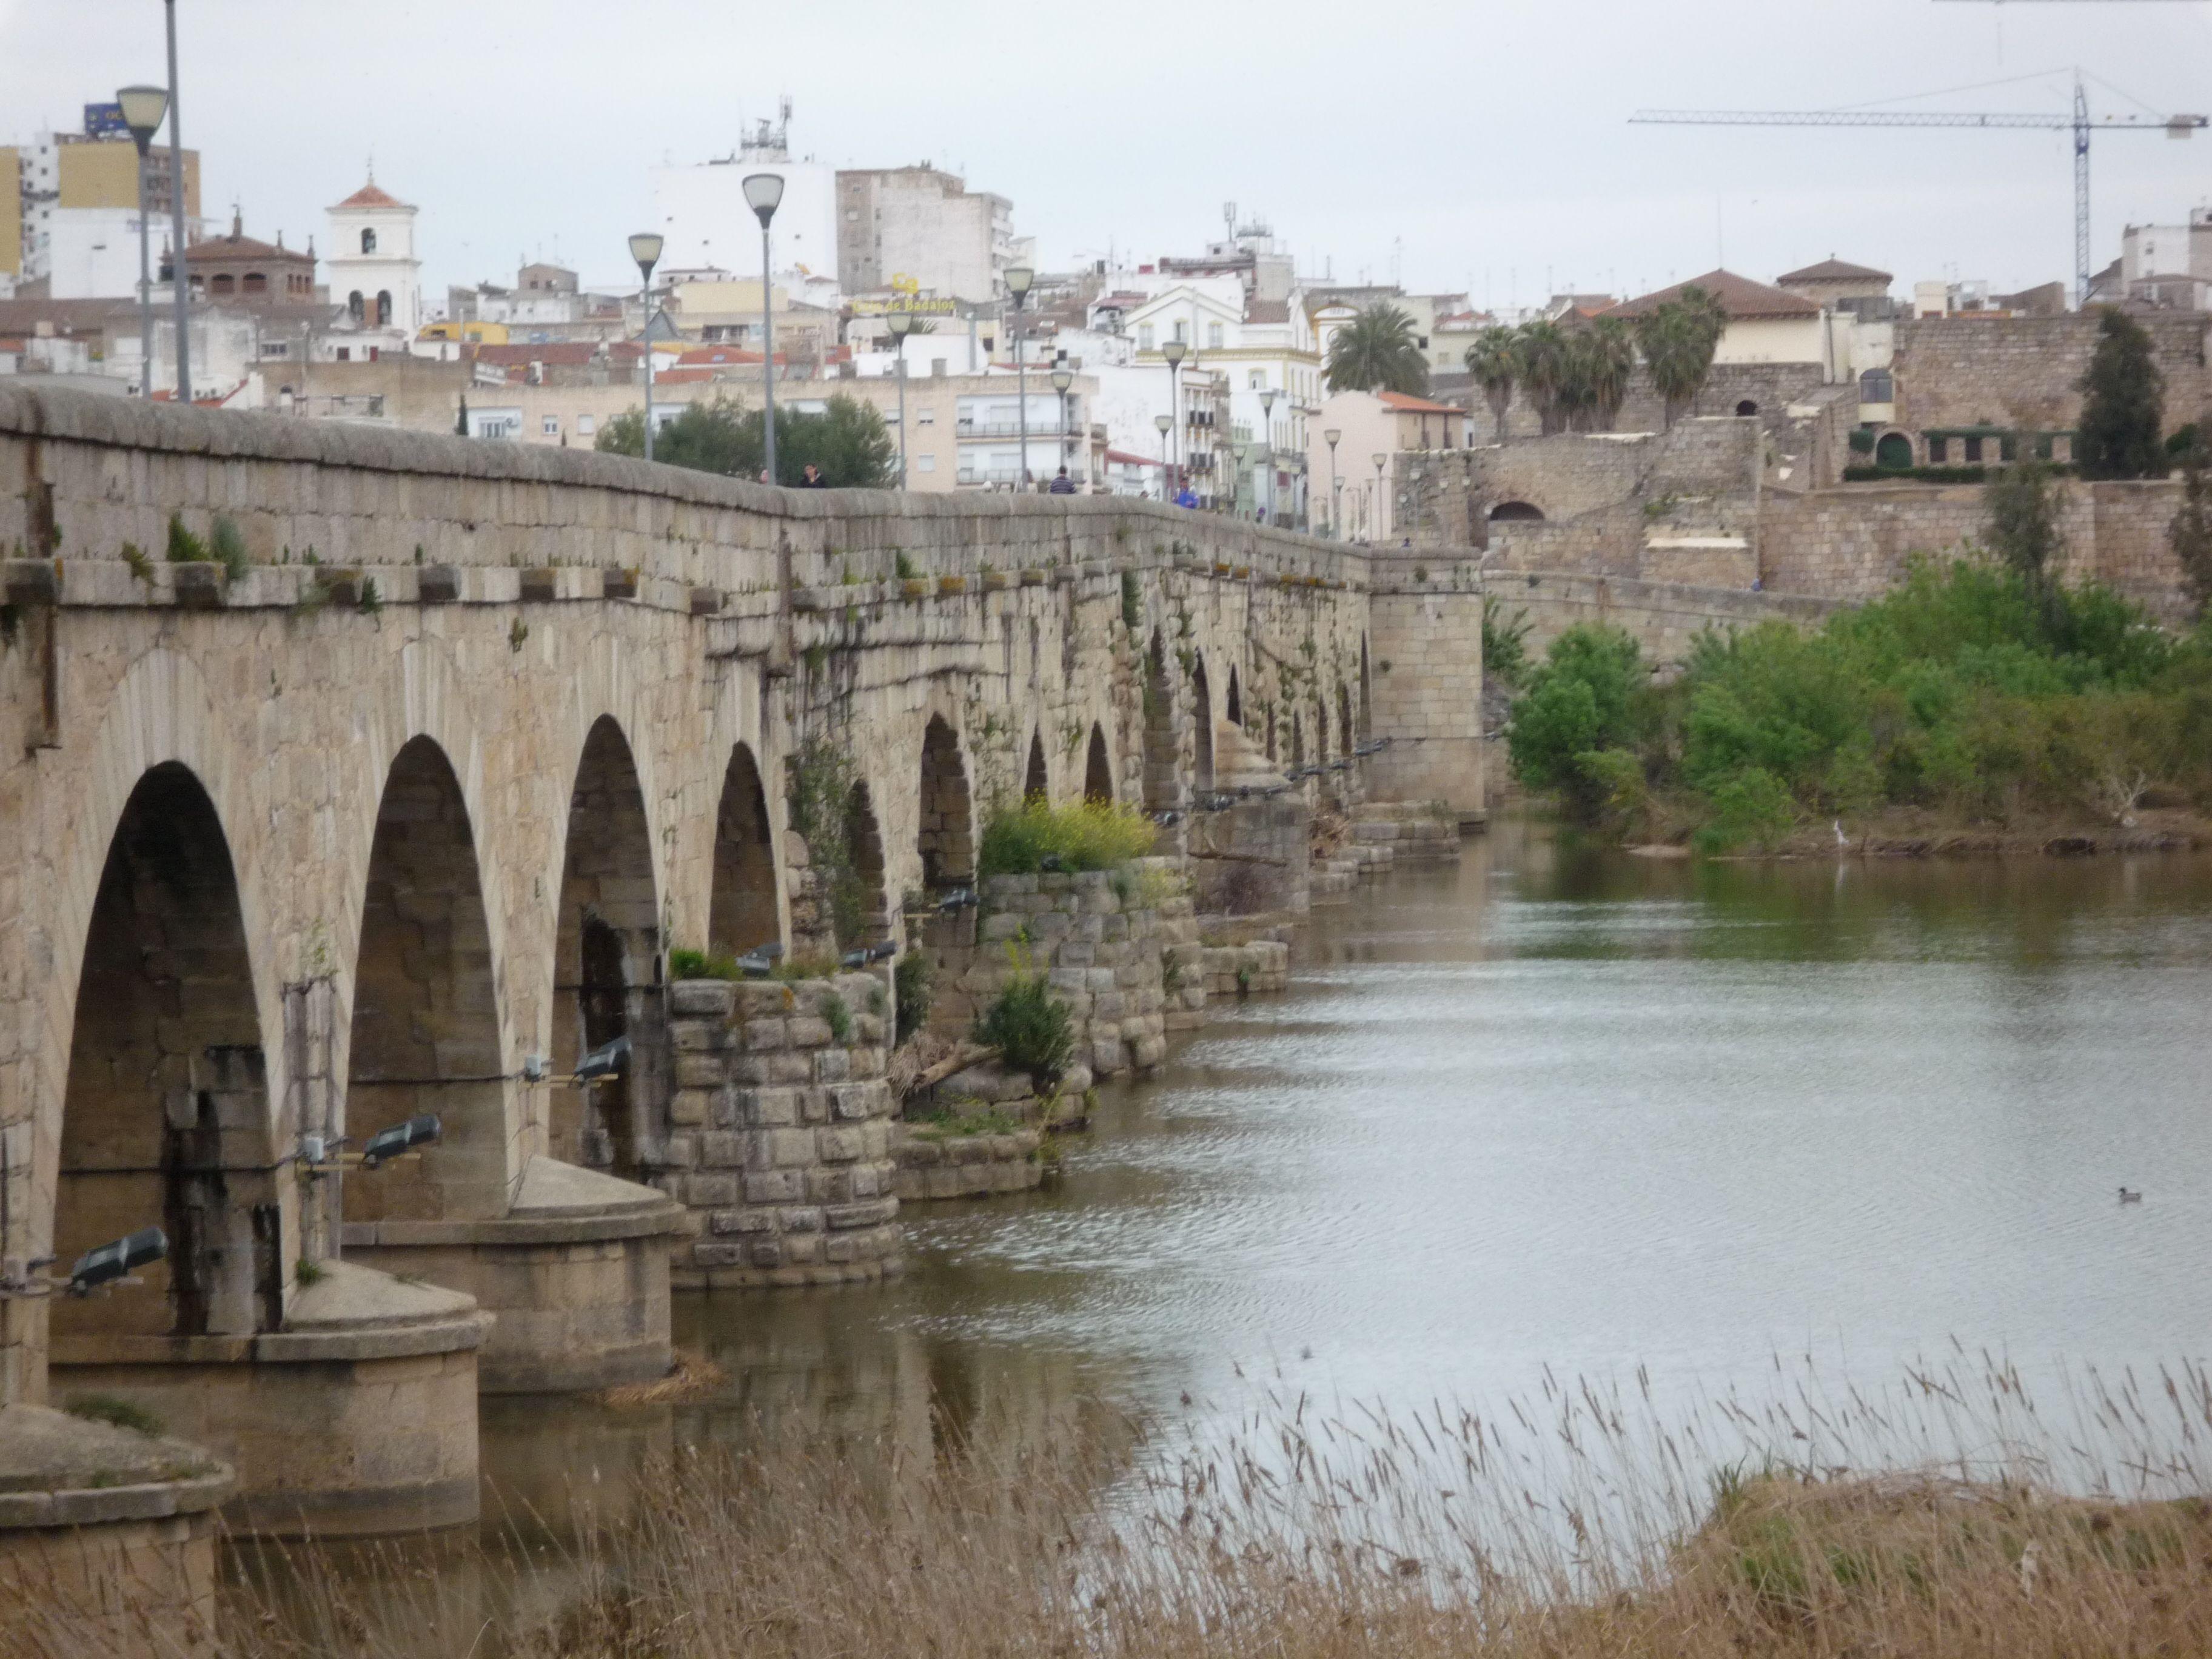 Ruta De La Plata A Santiago De Compostela Puente Romano Roman Roads Sevilla Spain